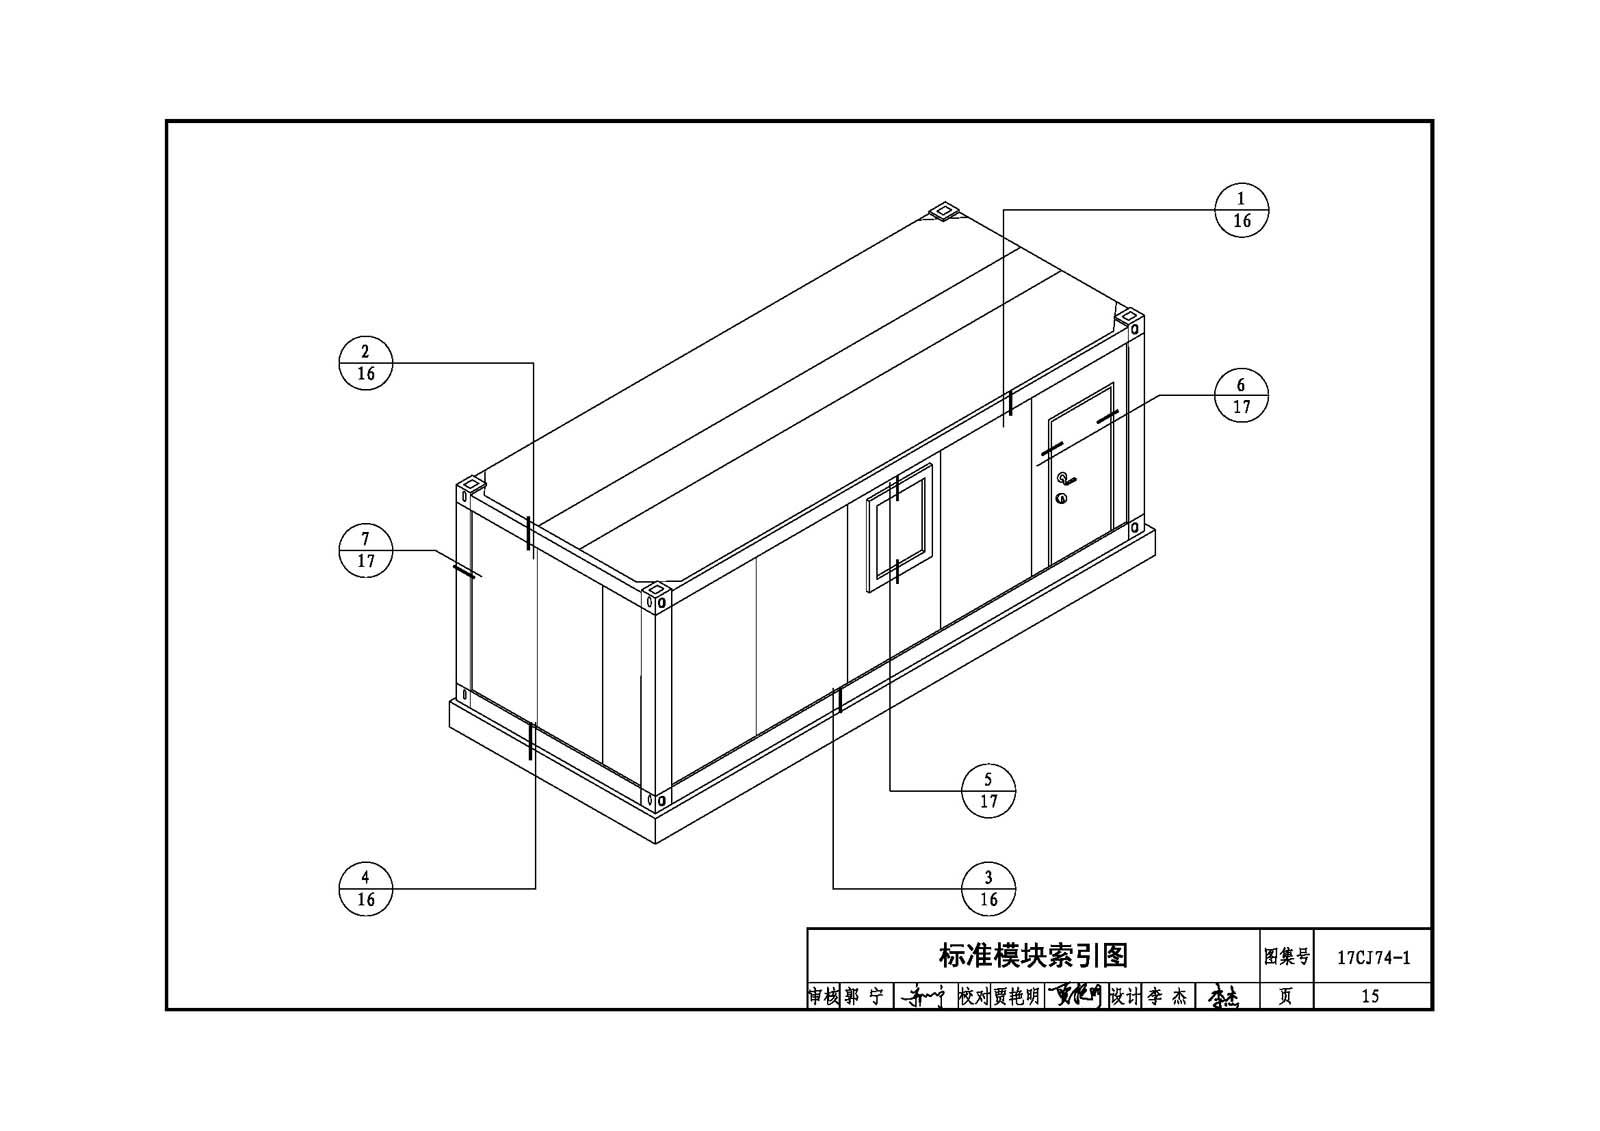 17cj74-1:钢结构箱式模块化房屋建筑构造(一)